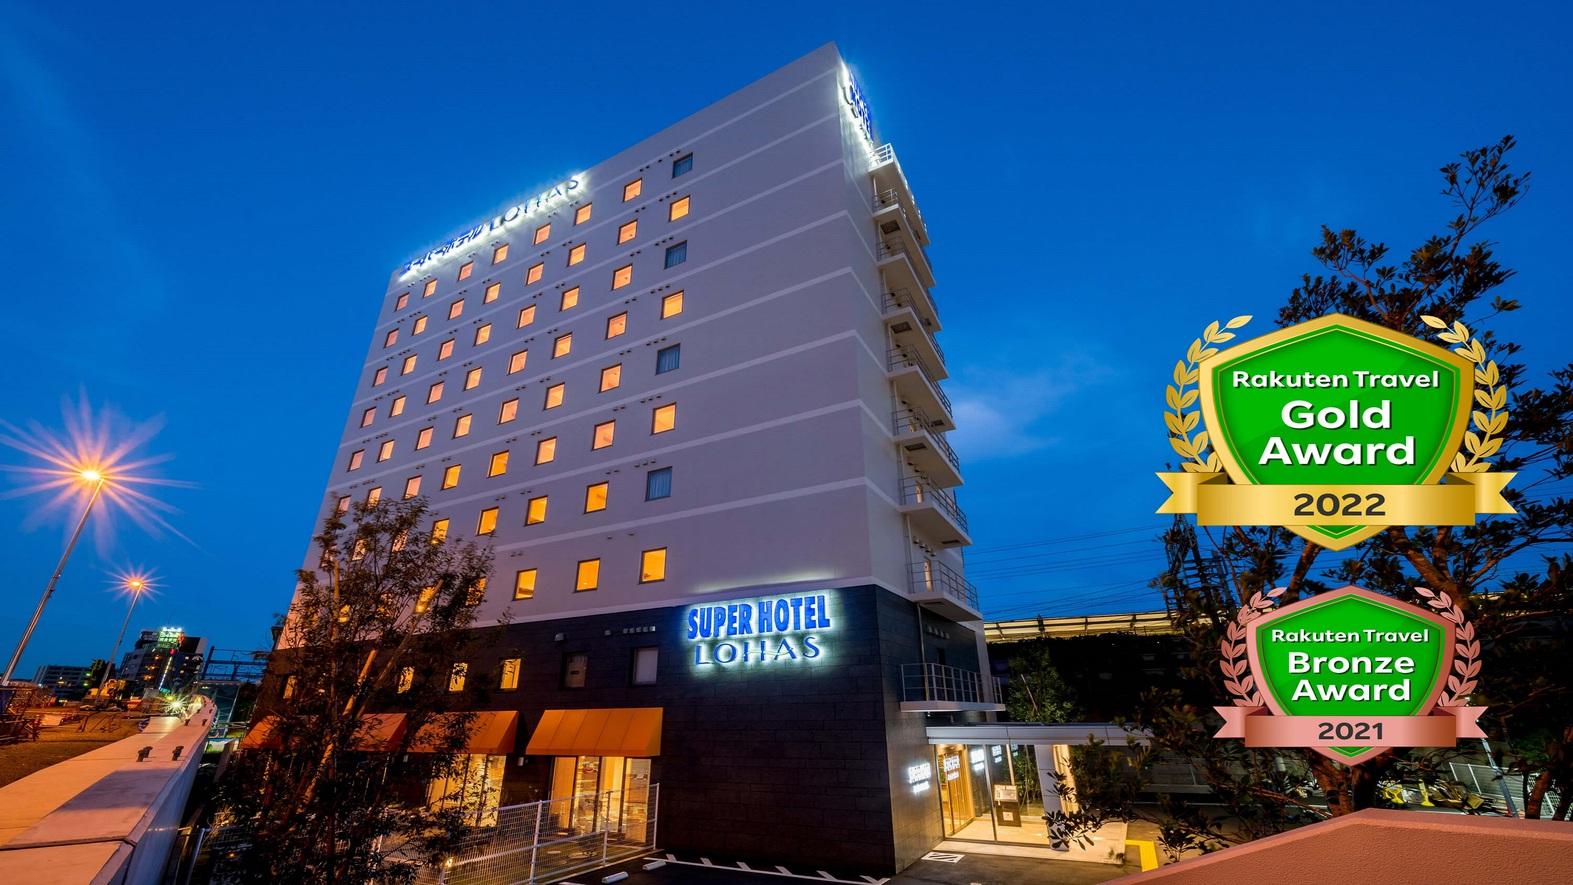 スーパーホテルPremier武蔵小杉駅前 天然温泉〜徳川・鷹狩の湯〜(旧Lohas武蔵小杉駅前)